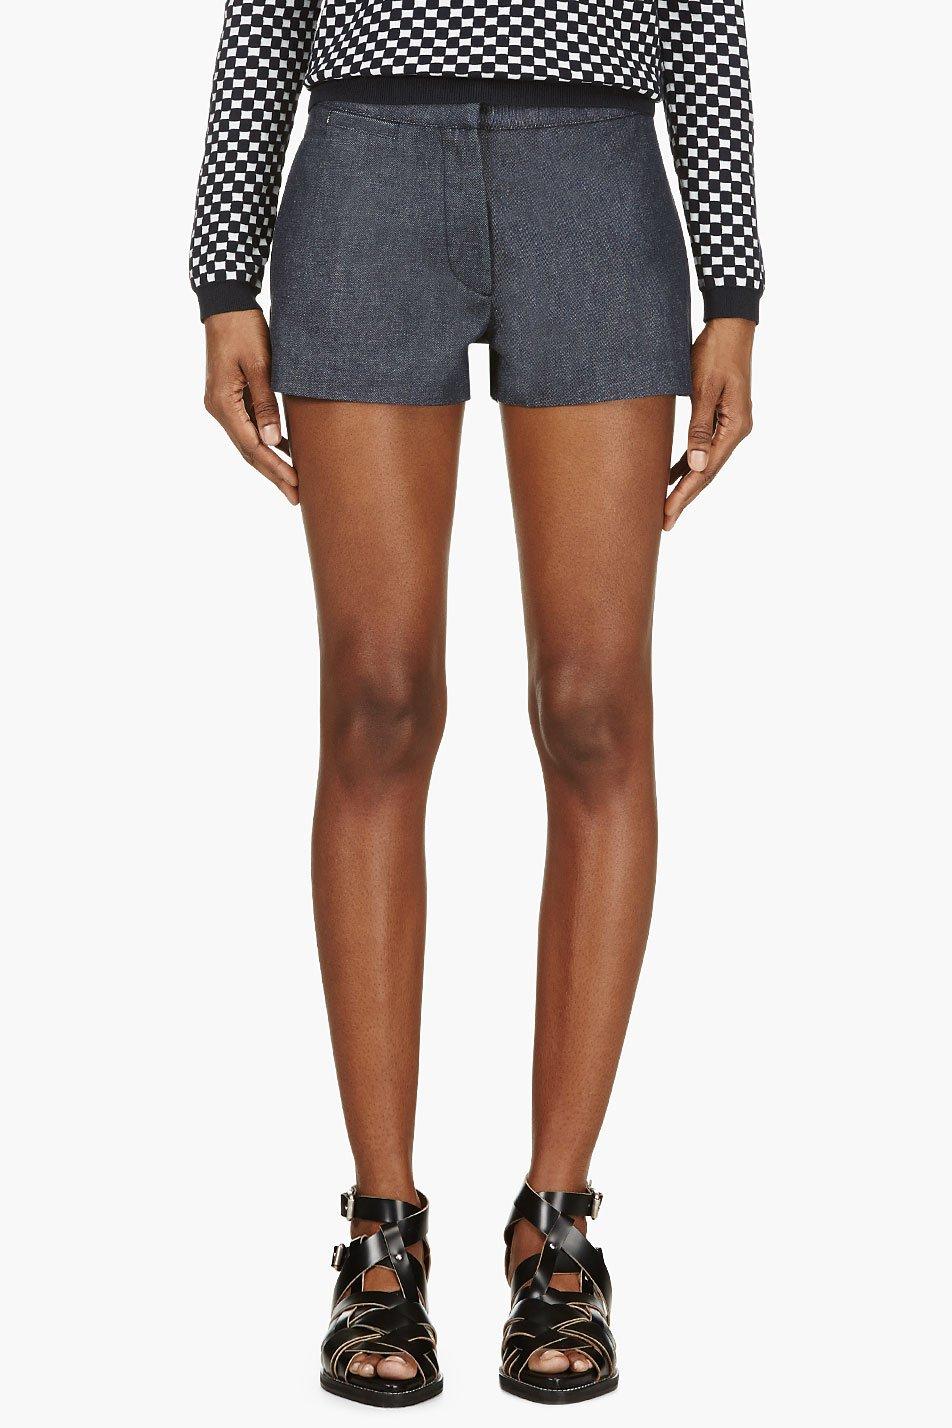 acne studios indigo sailor denim shorts